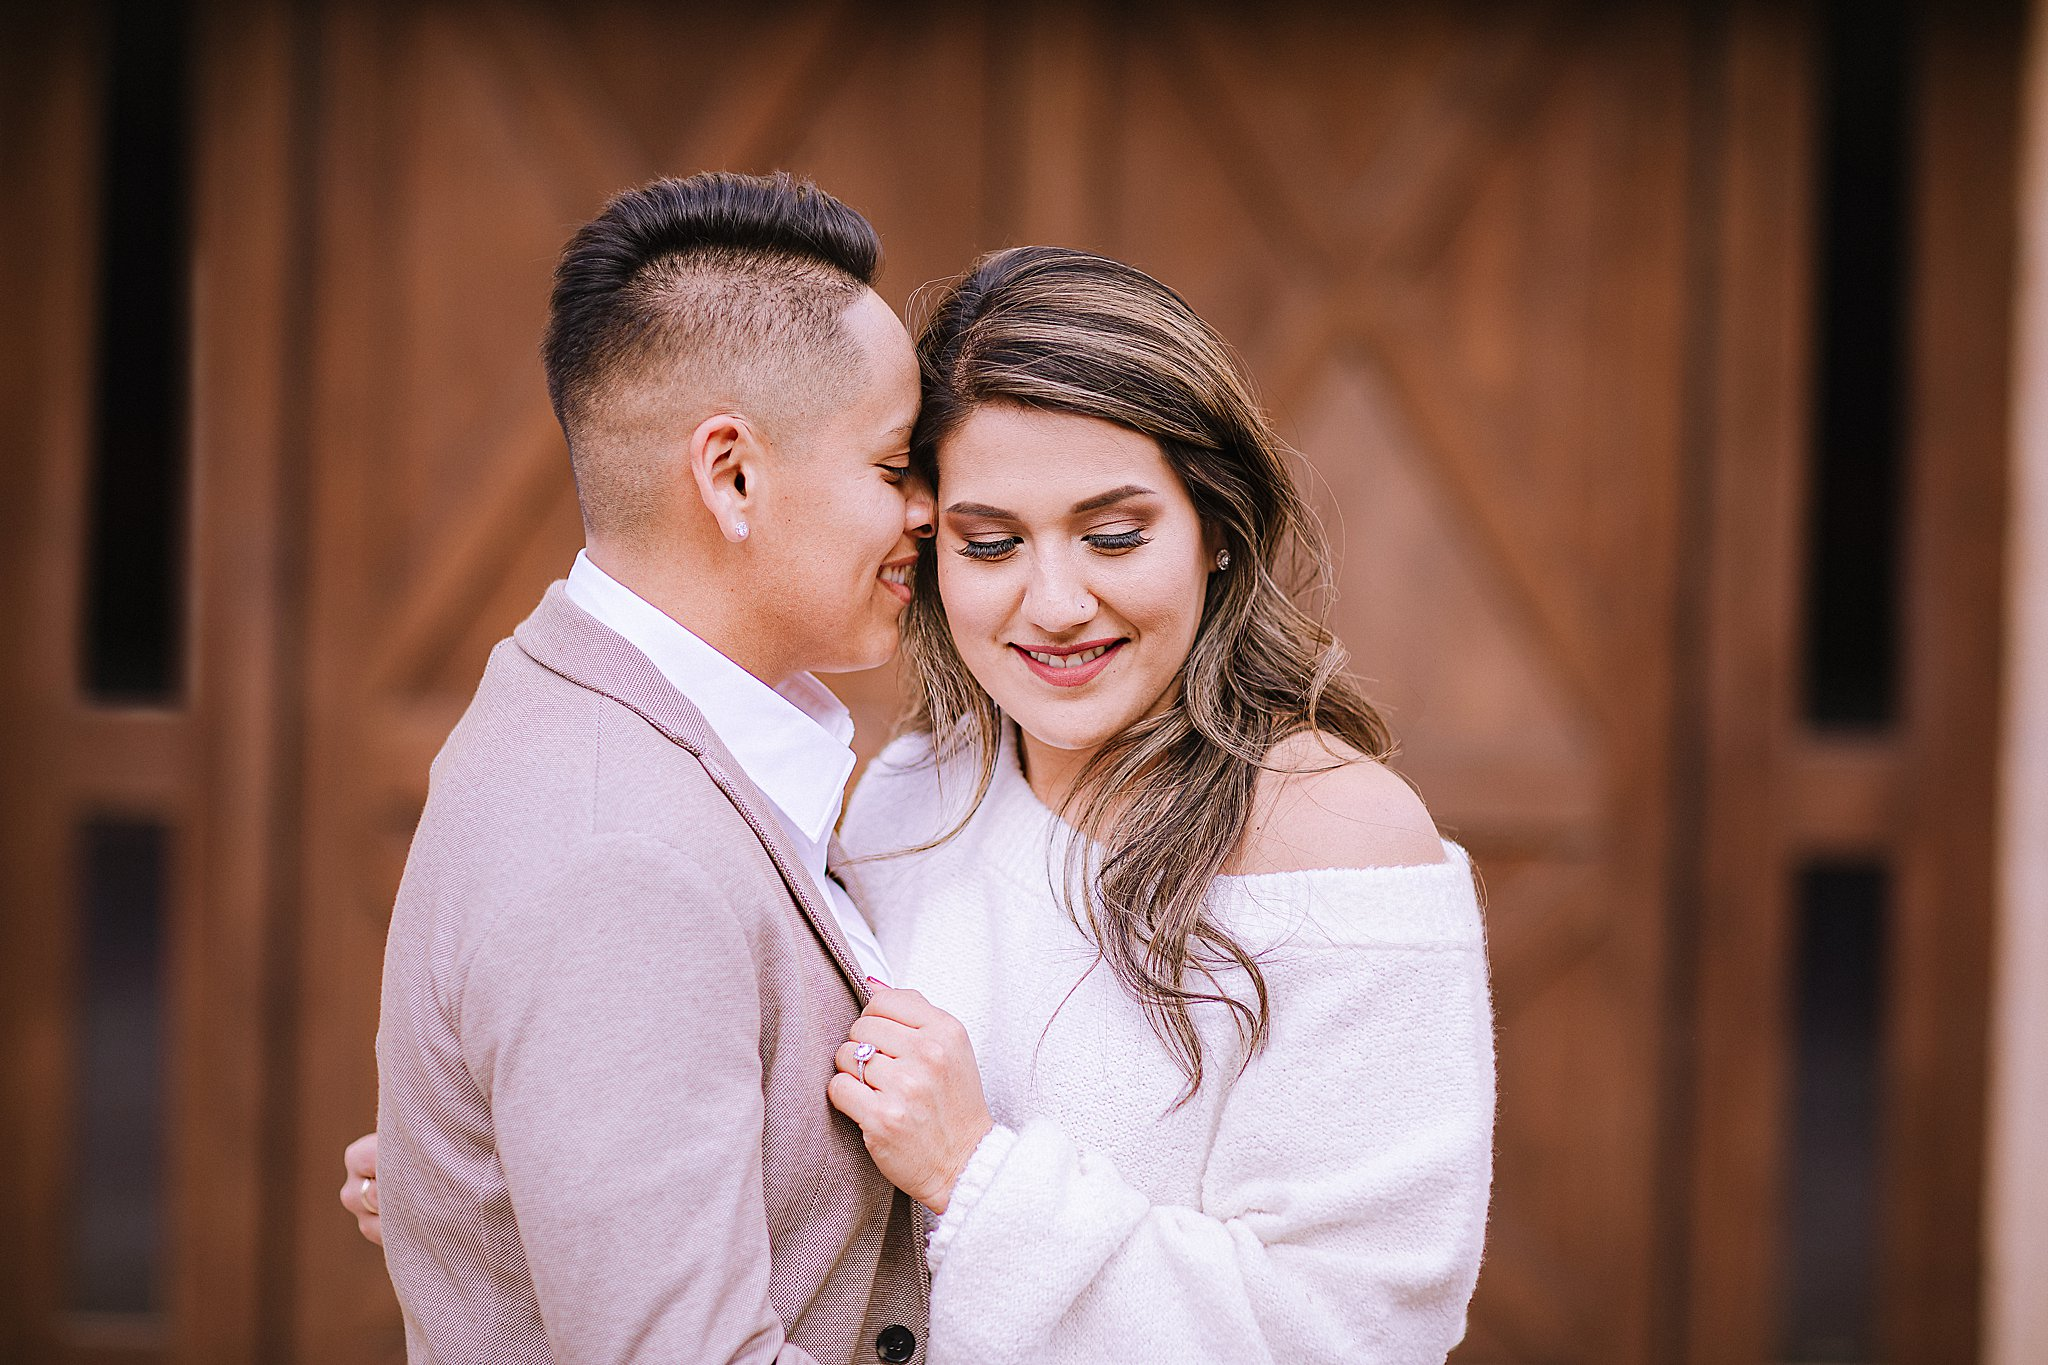 Carly-Barton-Photography-Texas-Engagement-Photographer-The-Historic-Pearl-San-Antonio_0008.jpg